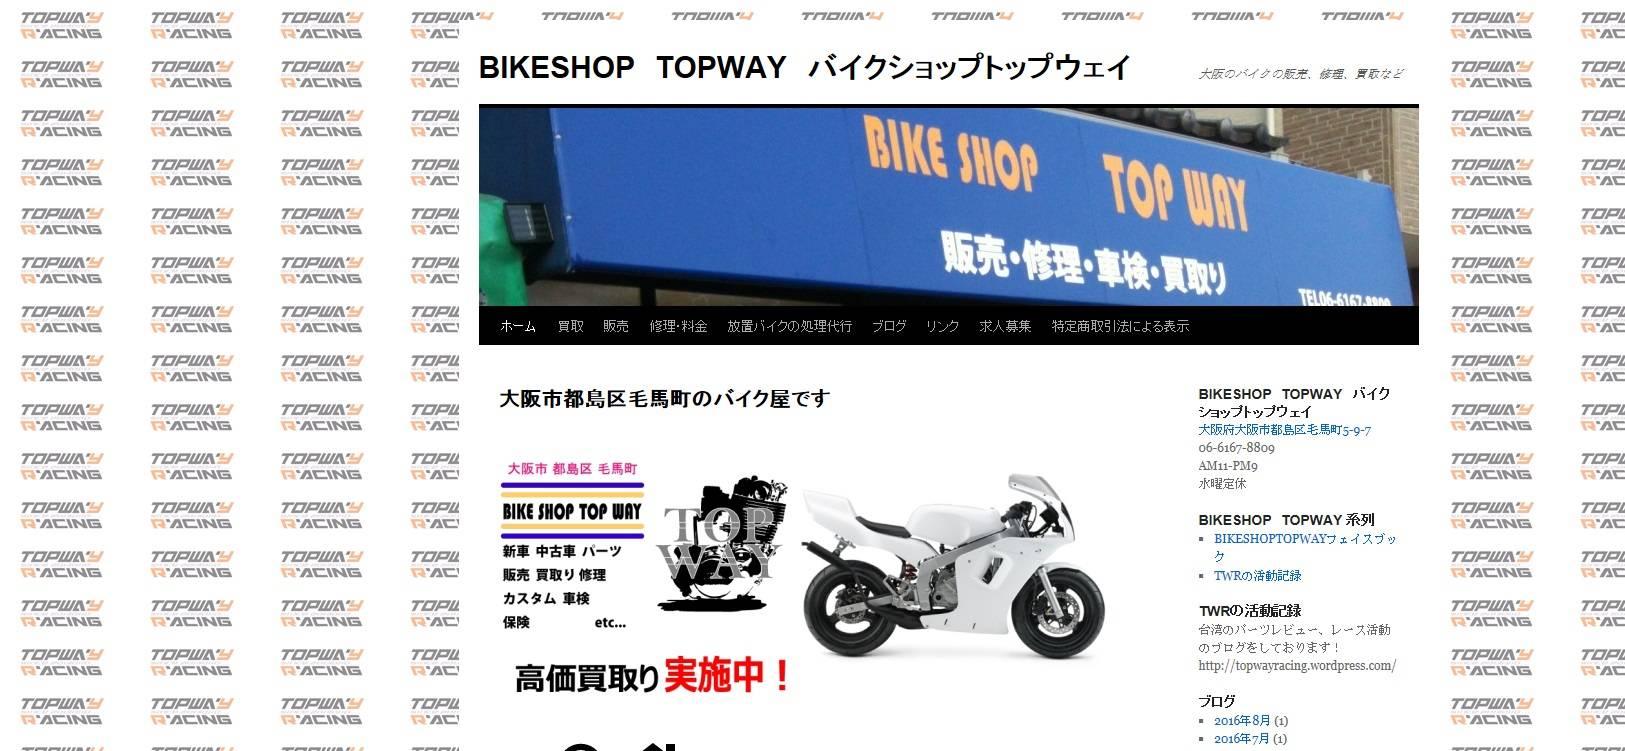 BIKE SHOP TOPWAY 守口店